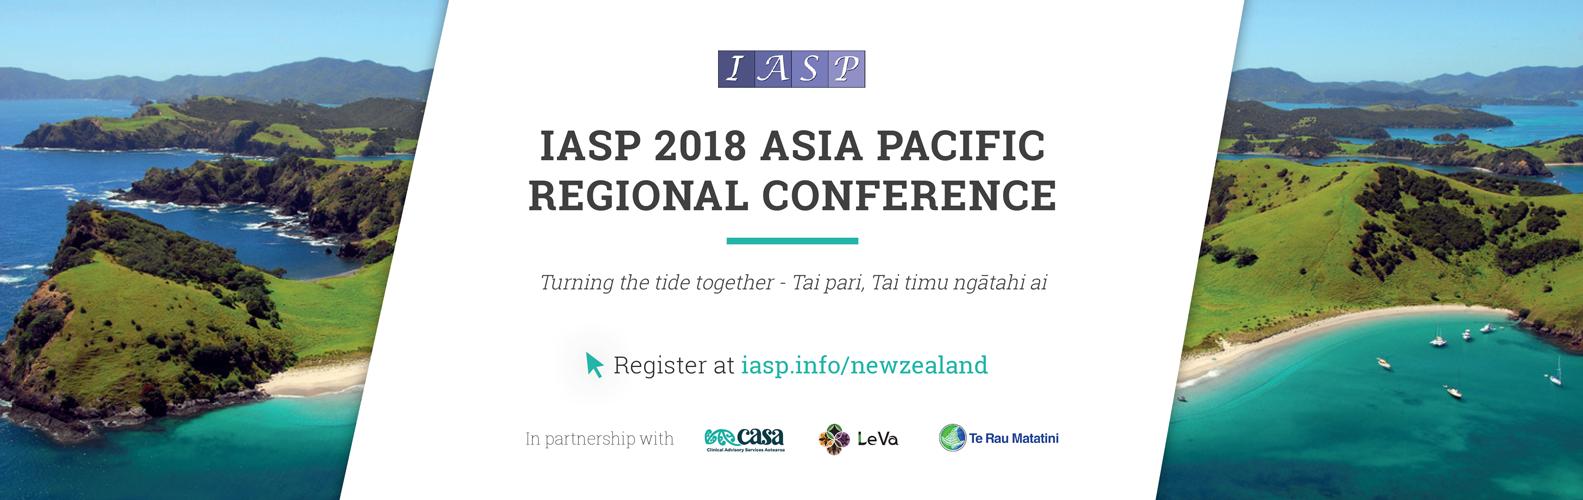 IASP 2018 testing